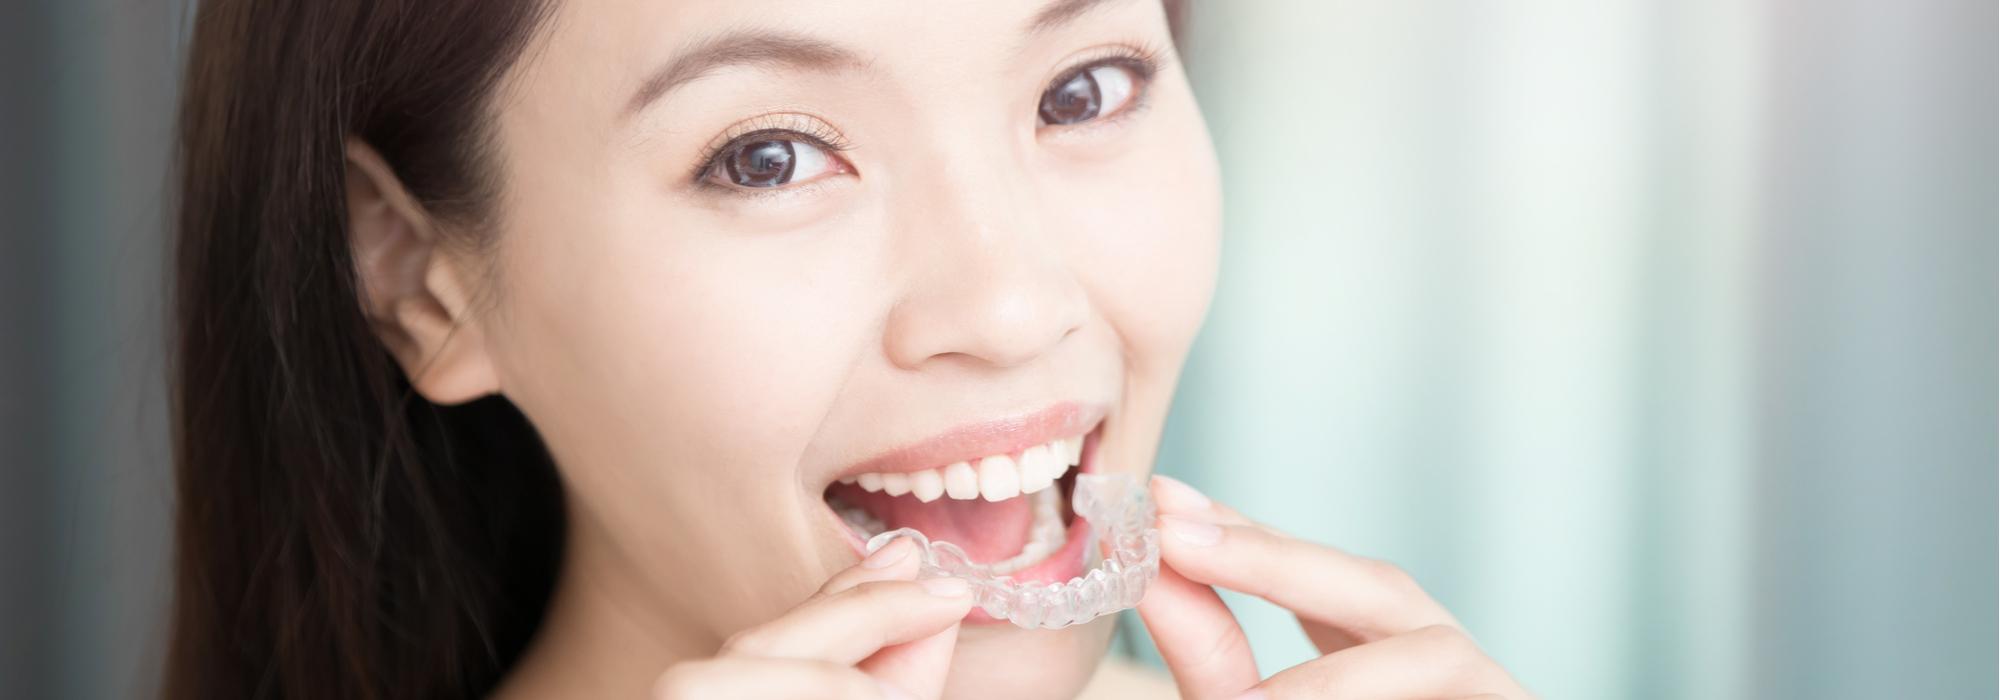 Penn Dental Medicine orthodontics